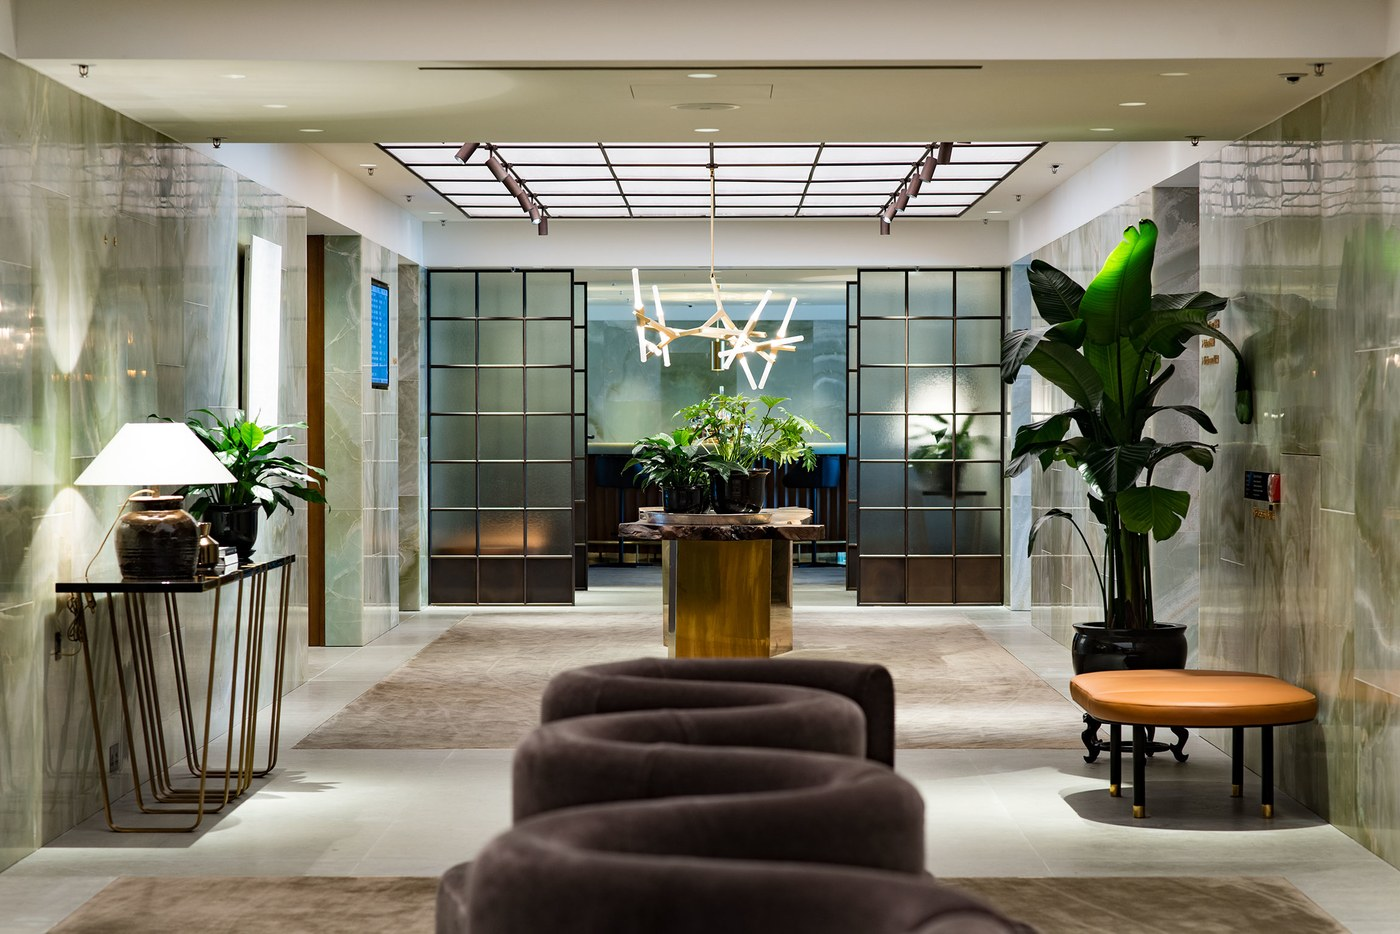 The Leading British Interior Designers By AD 100 List – II Part Studioilse Interiors